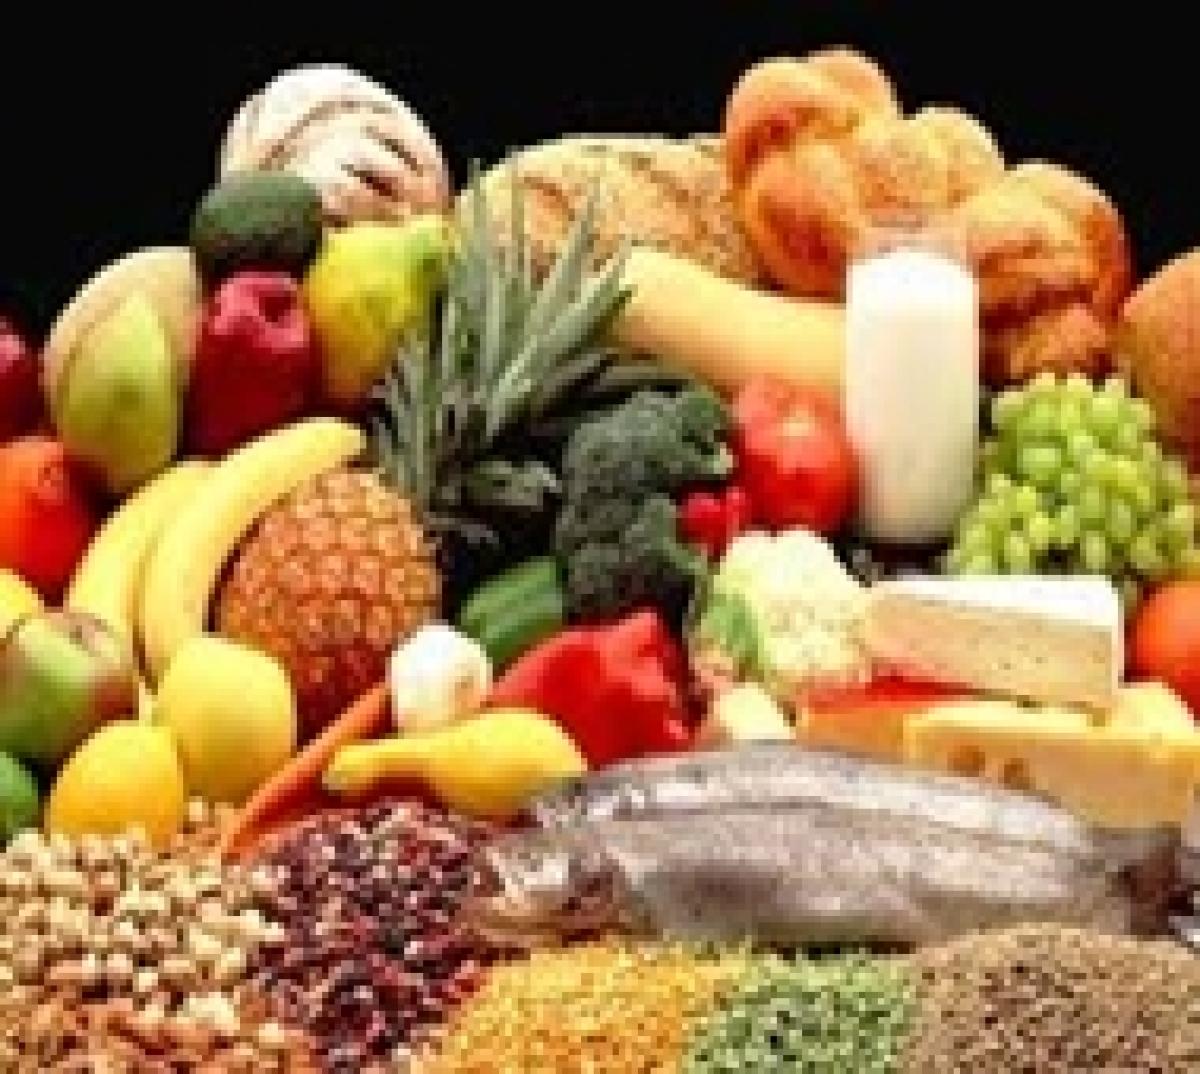 Fruits cut breast cancer risk